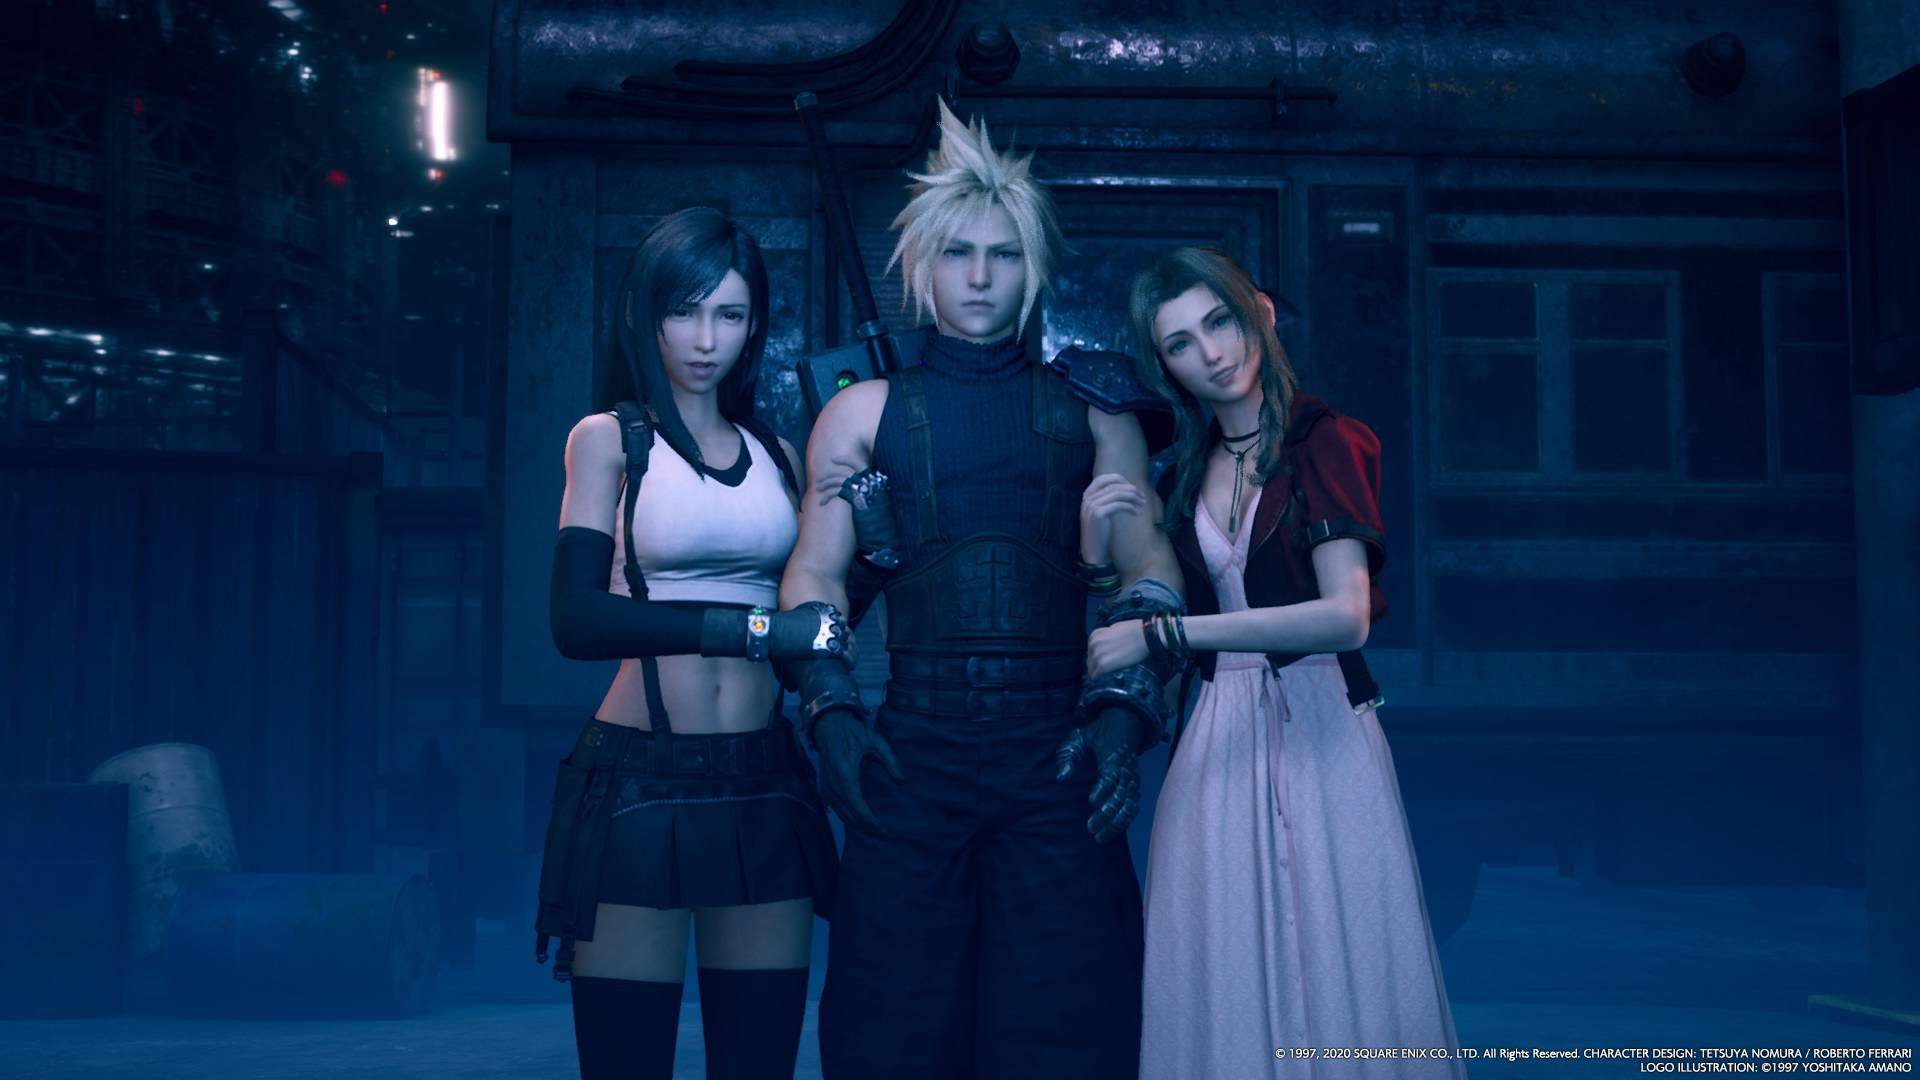 Aerith, Cloud, and Tifa